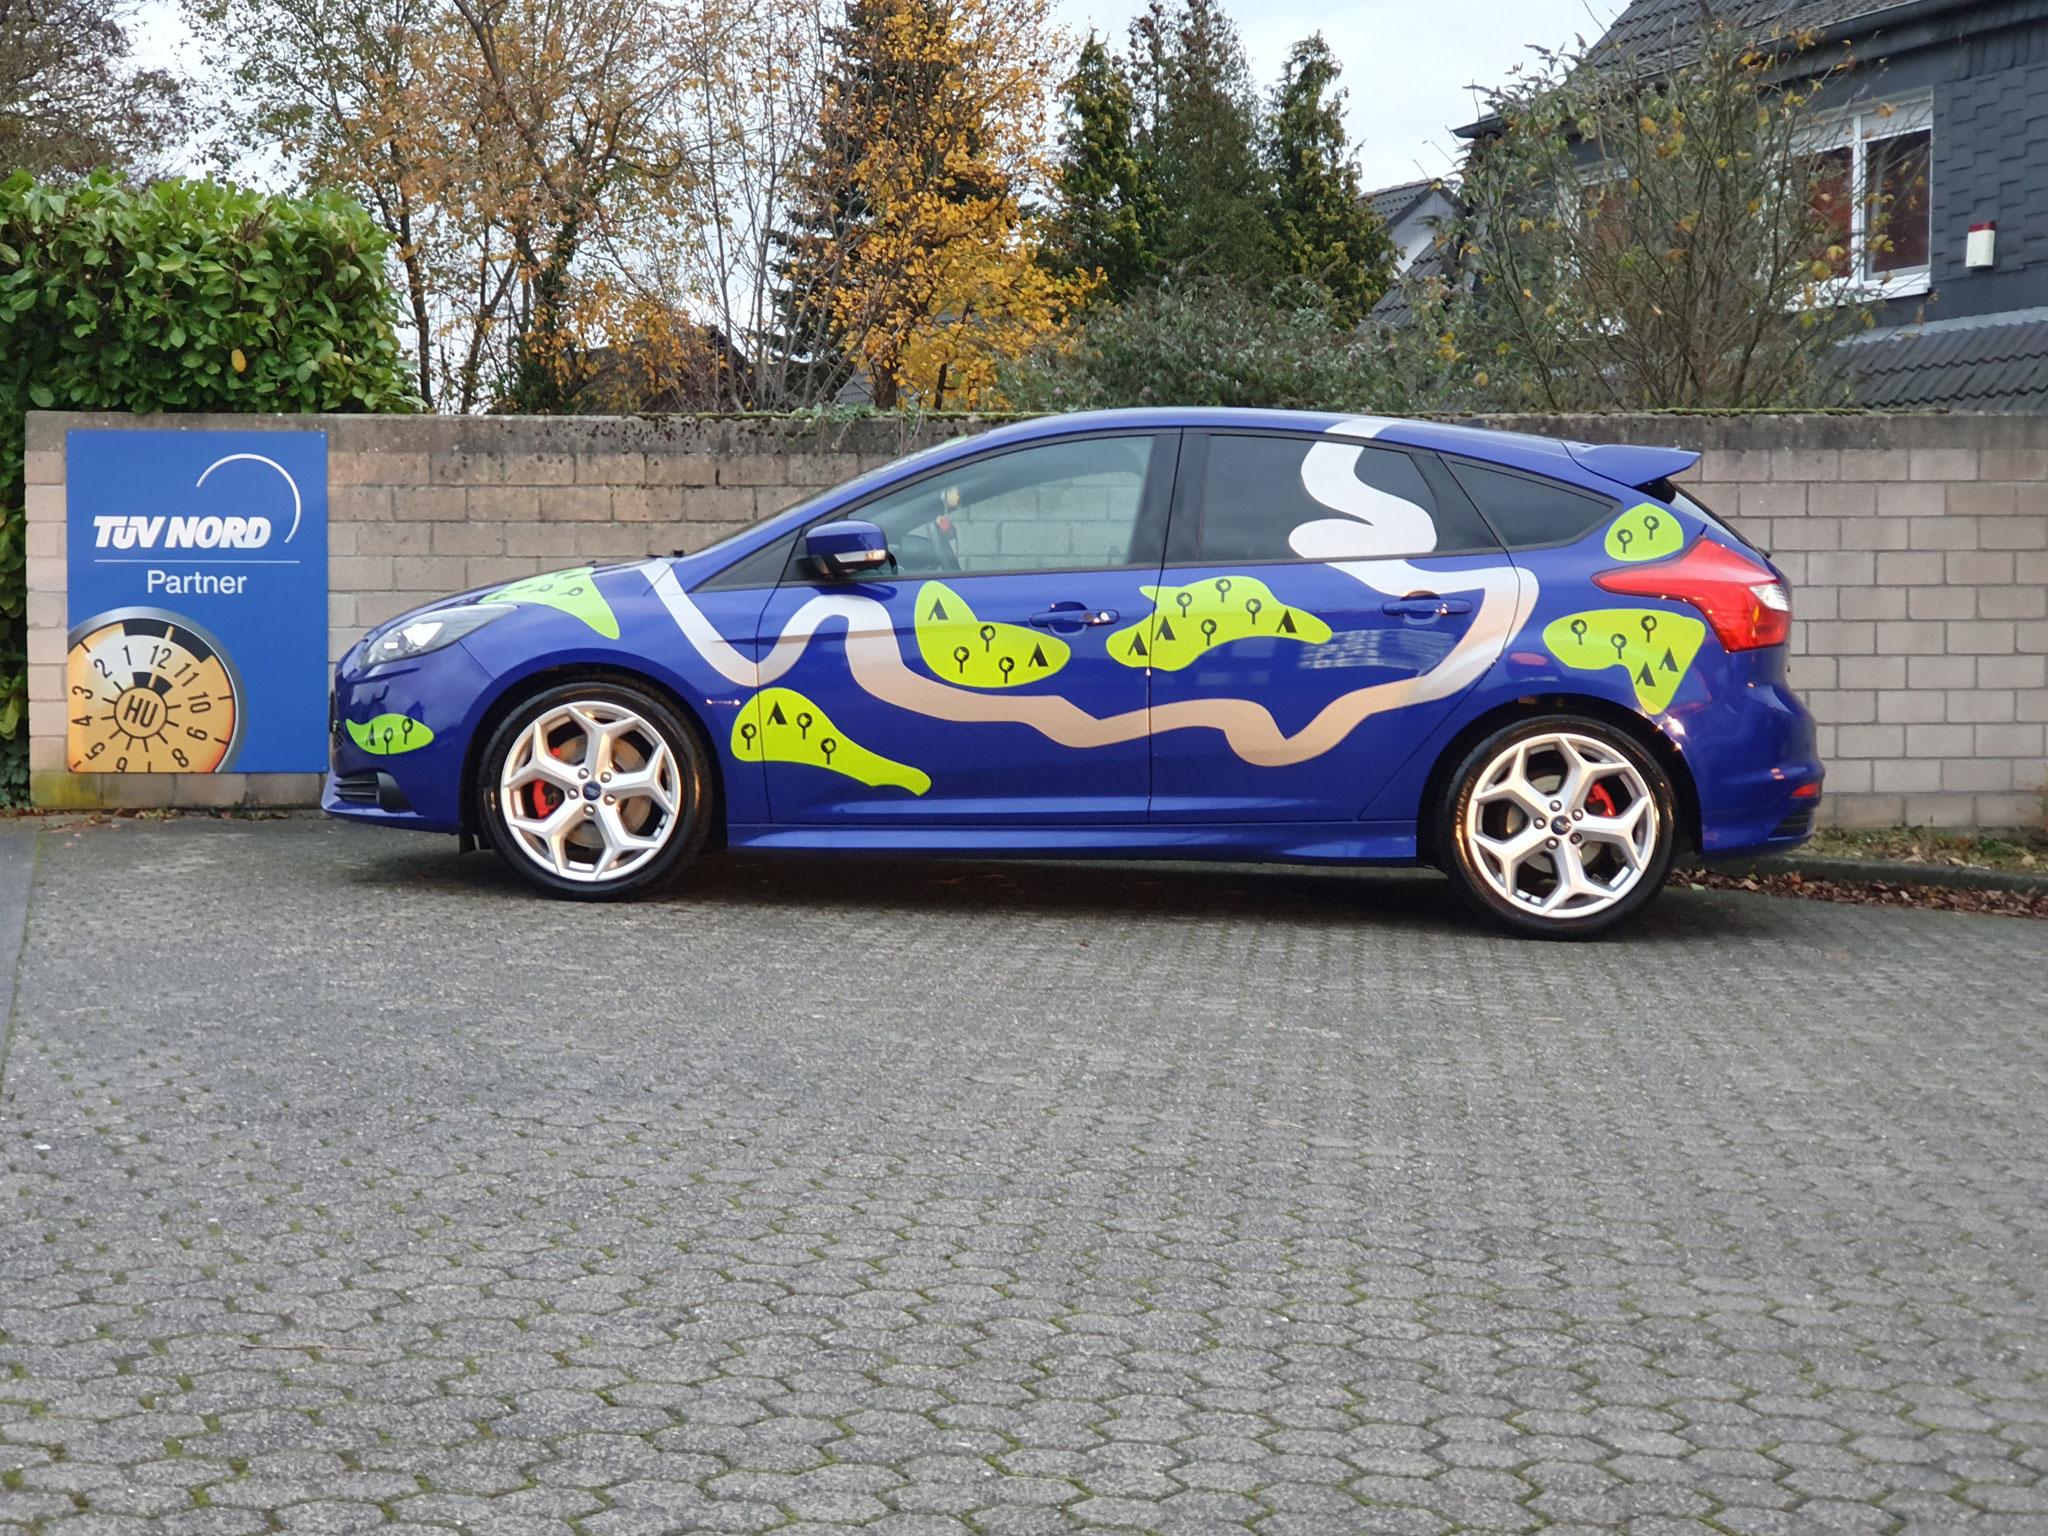 Themenfahrzeuge (Nürburgring-Edition)